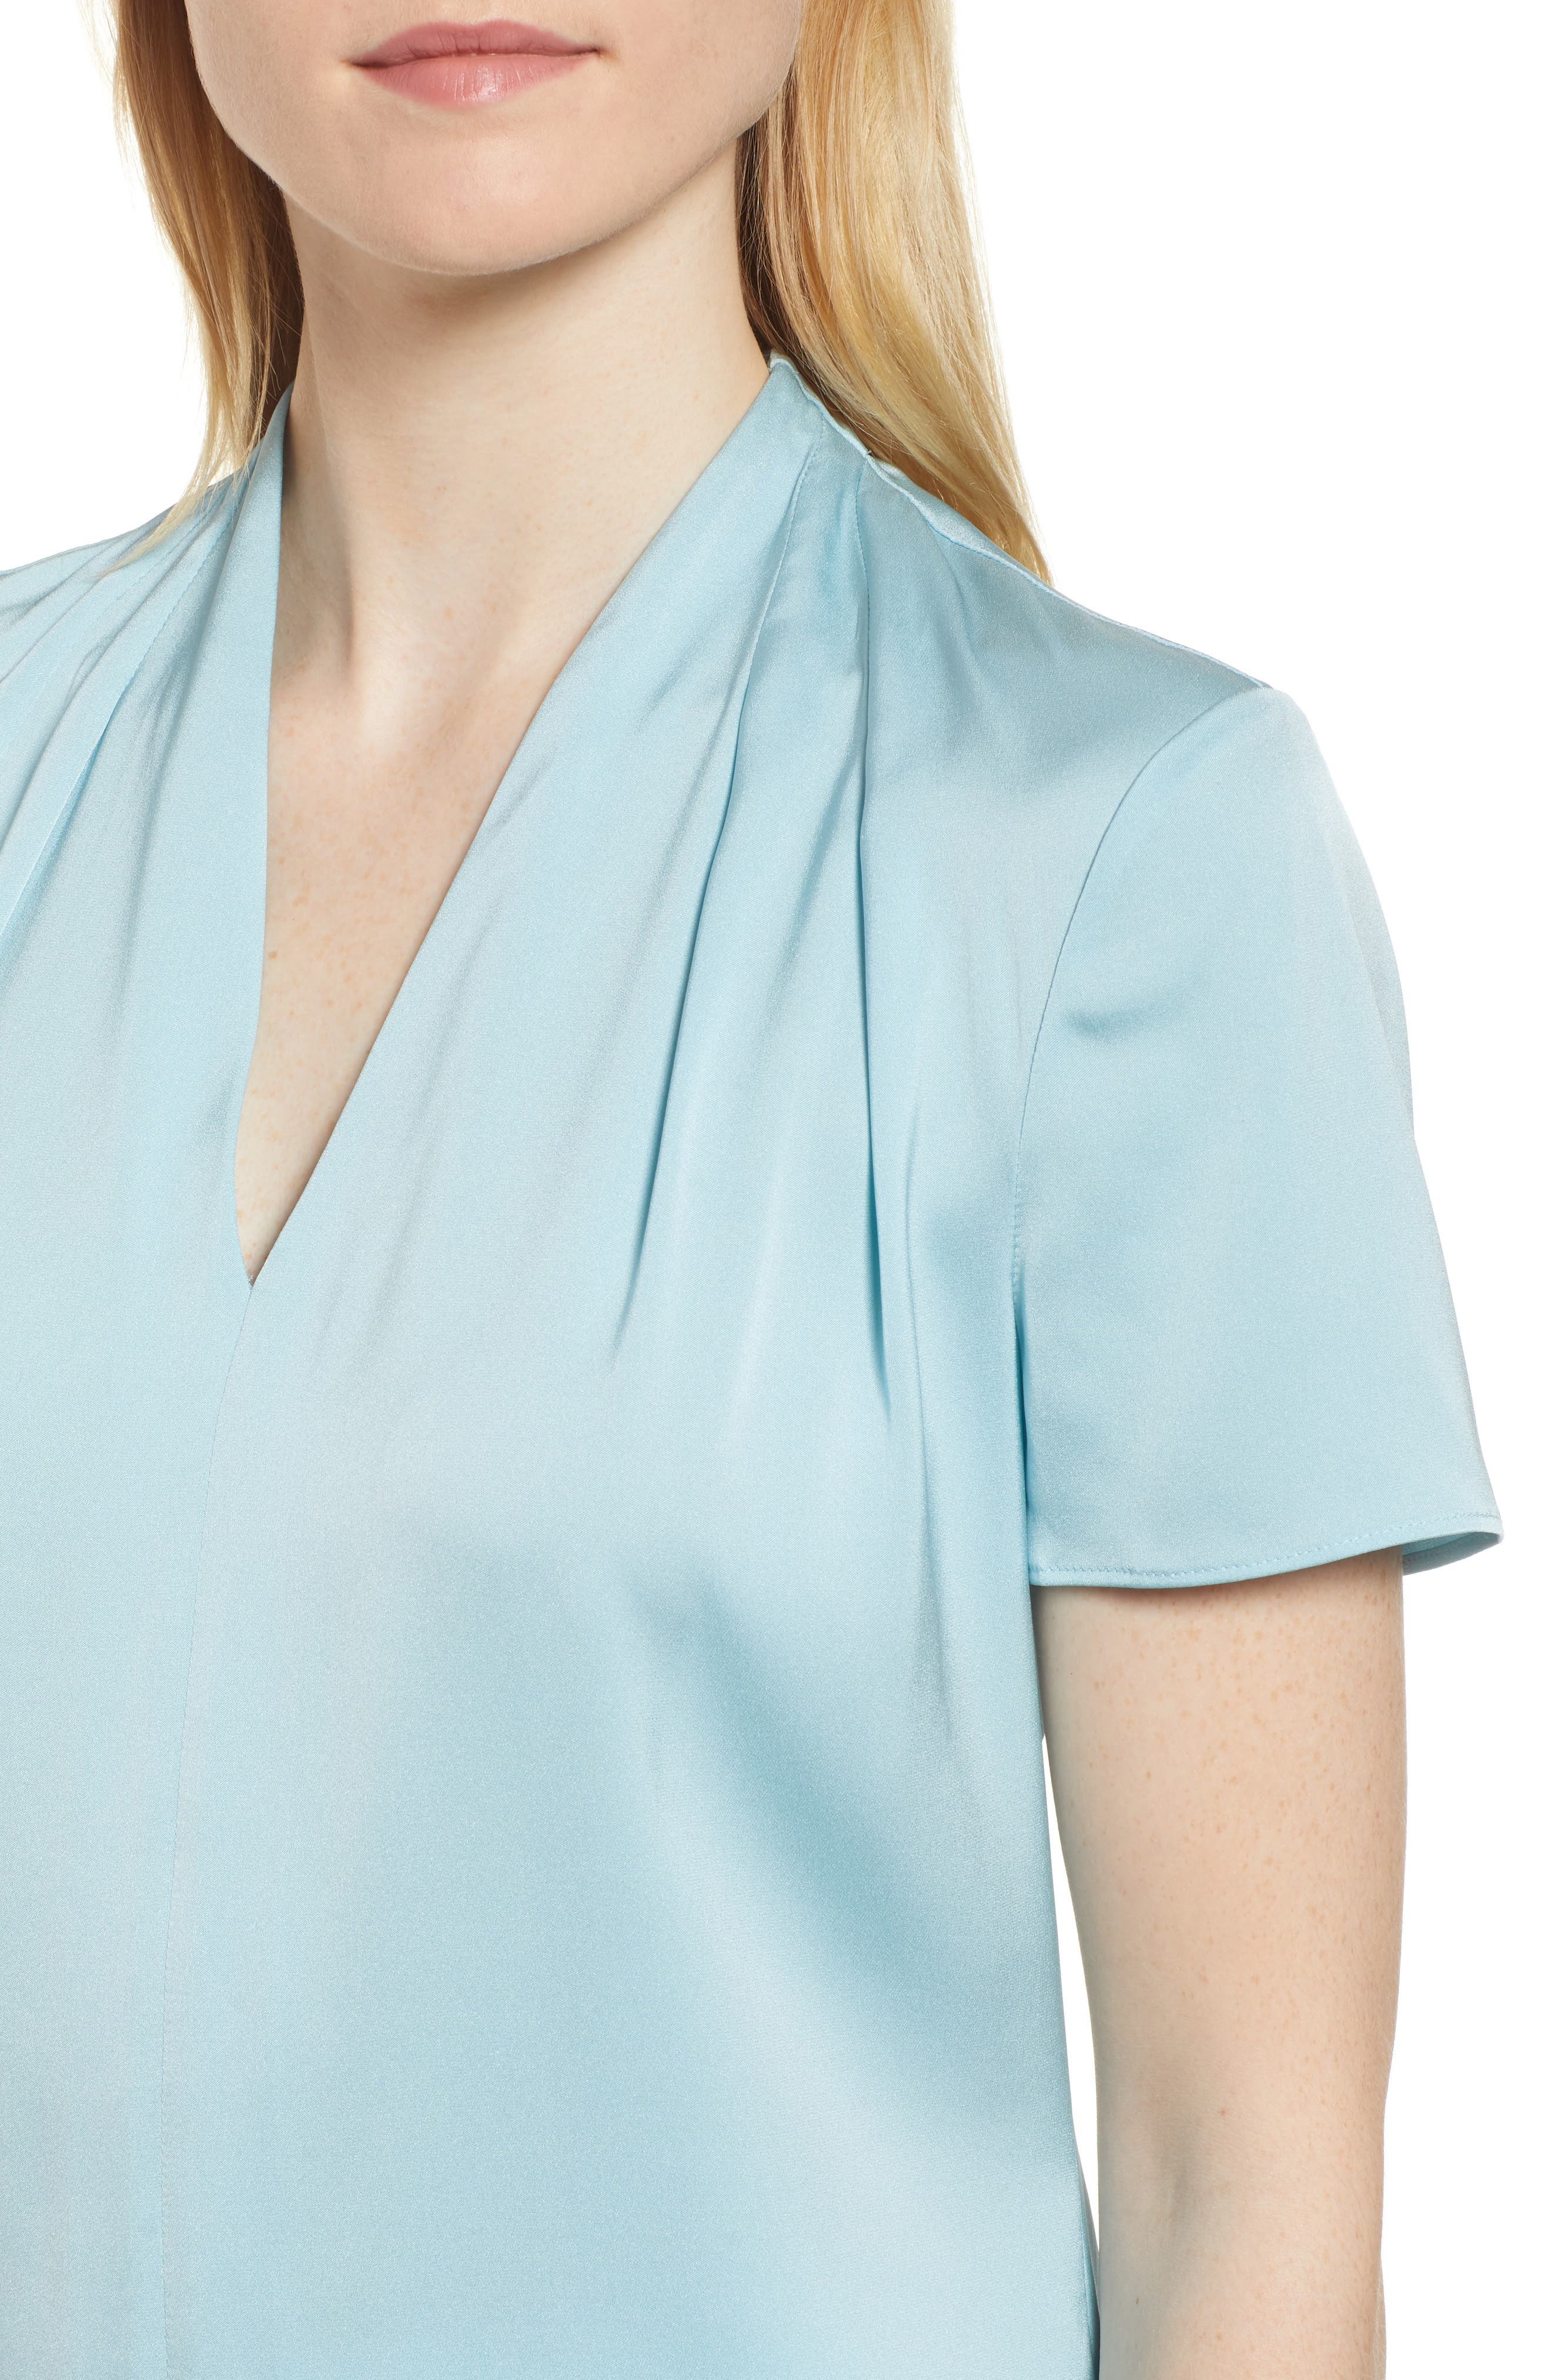 Insina Stretch Silk Blouse,                             Alternate thumbnail 4, color,                             Lagoon Blue